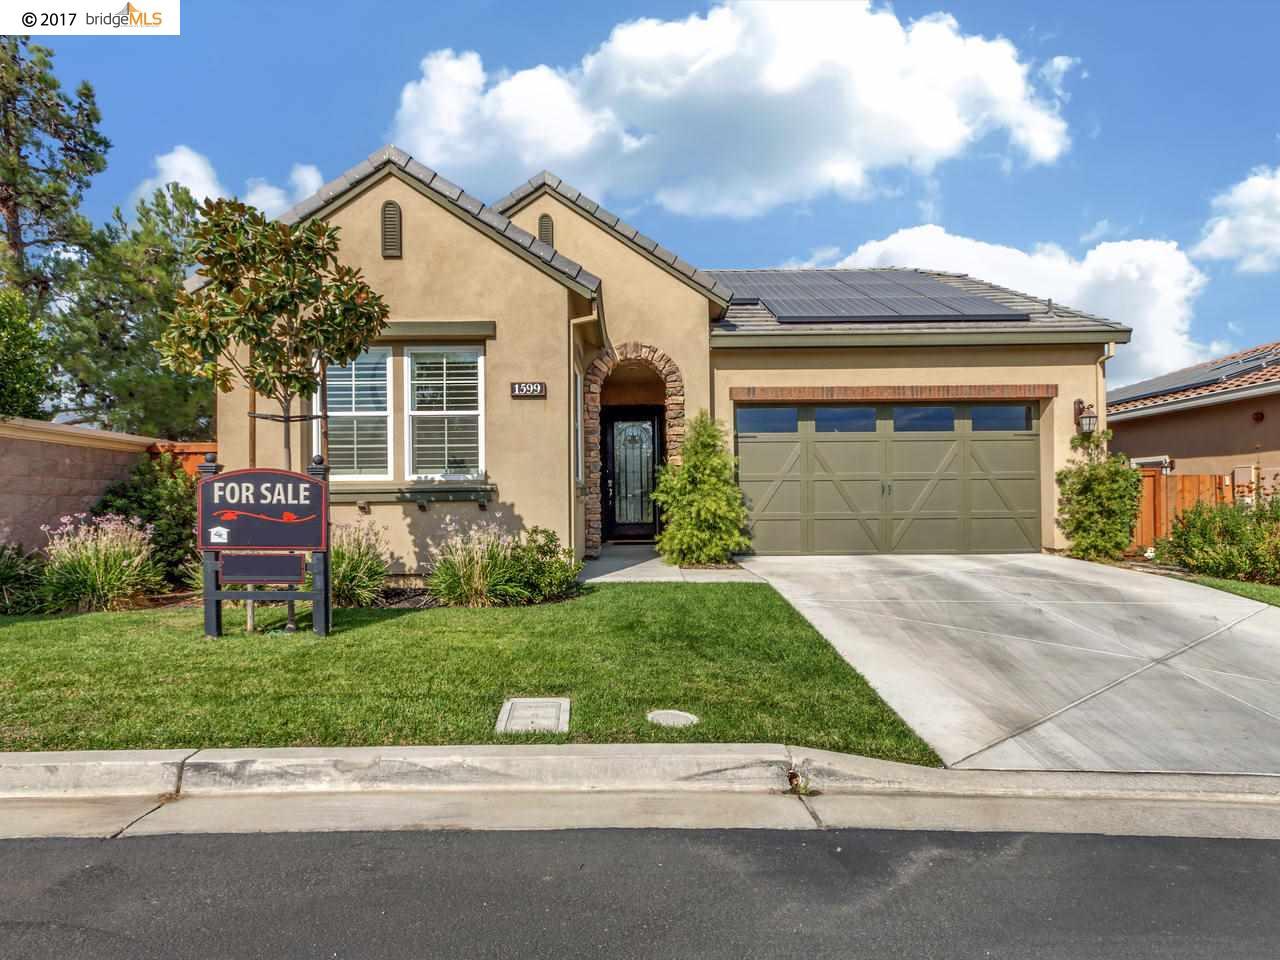 1599 California Trl, BRENTWOOD, CA 94513